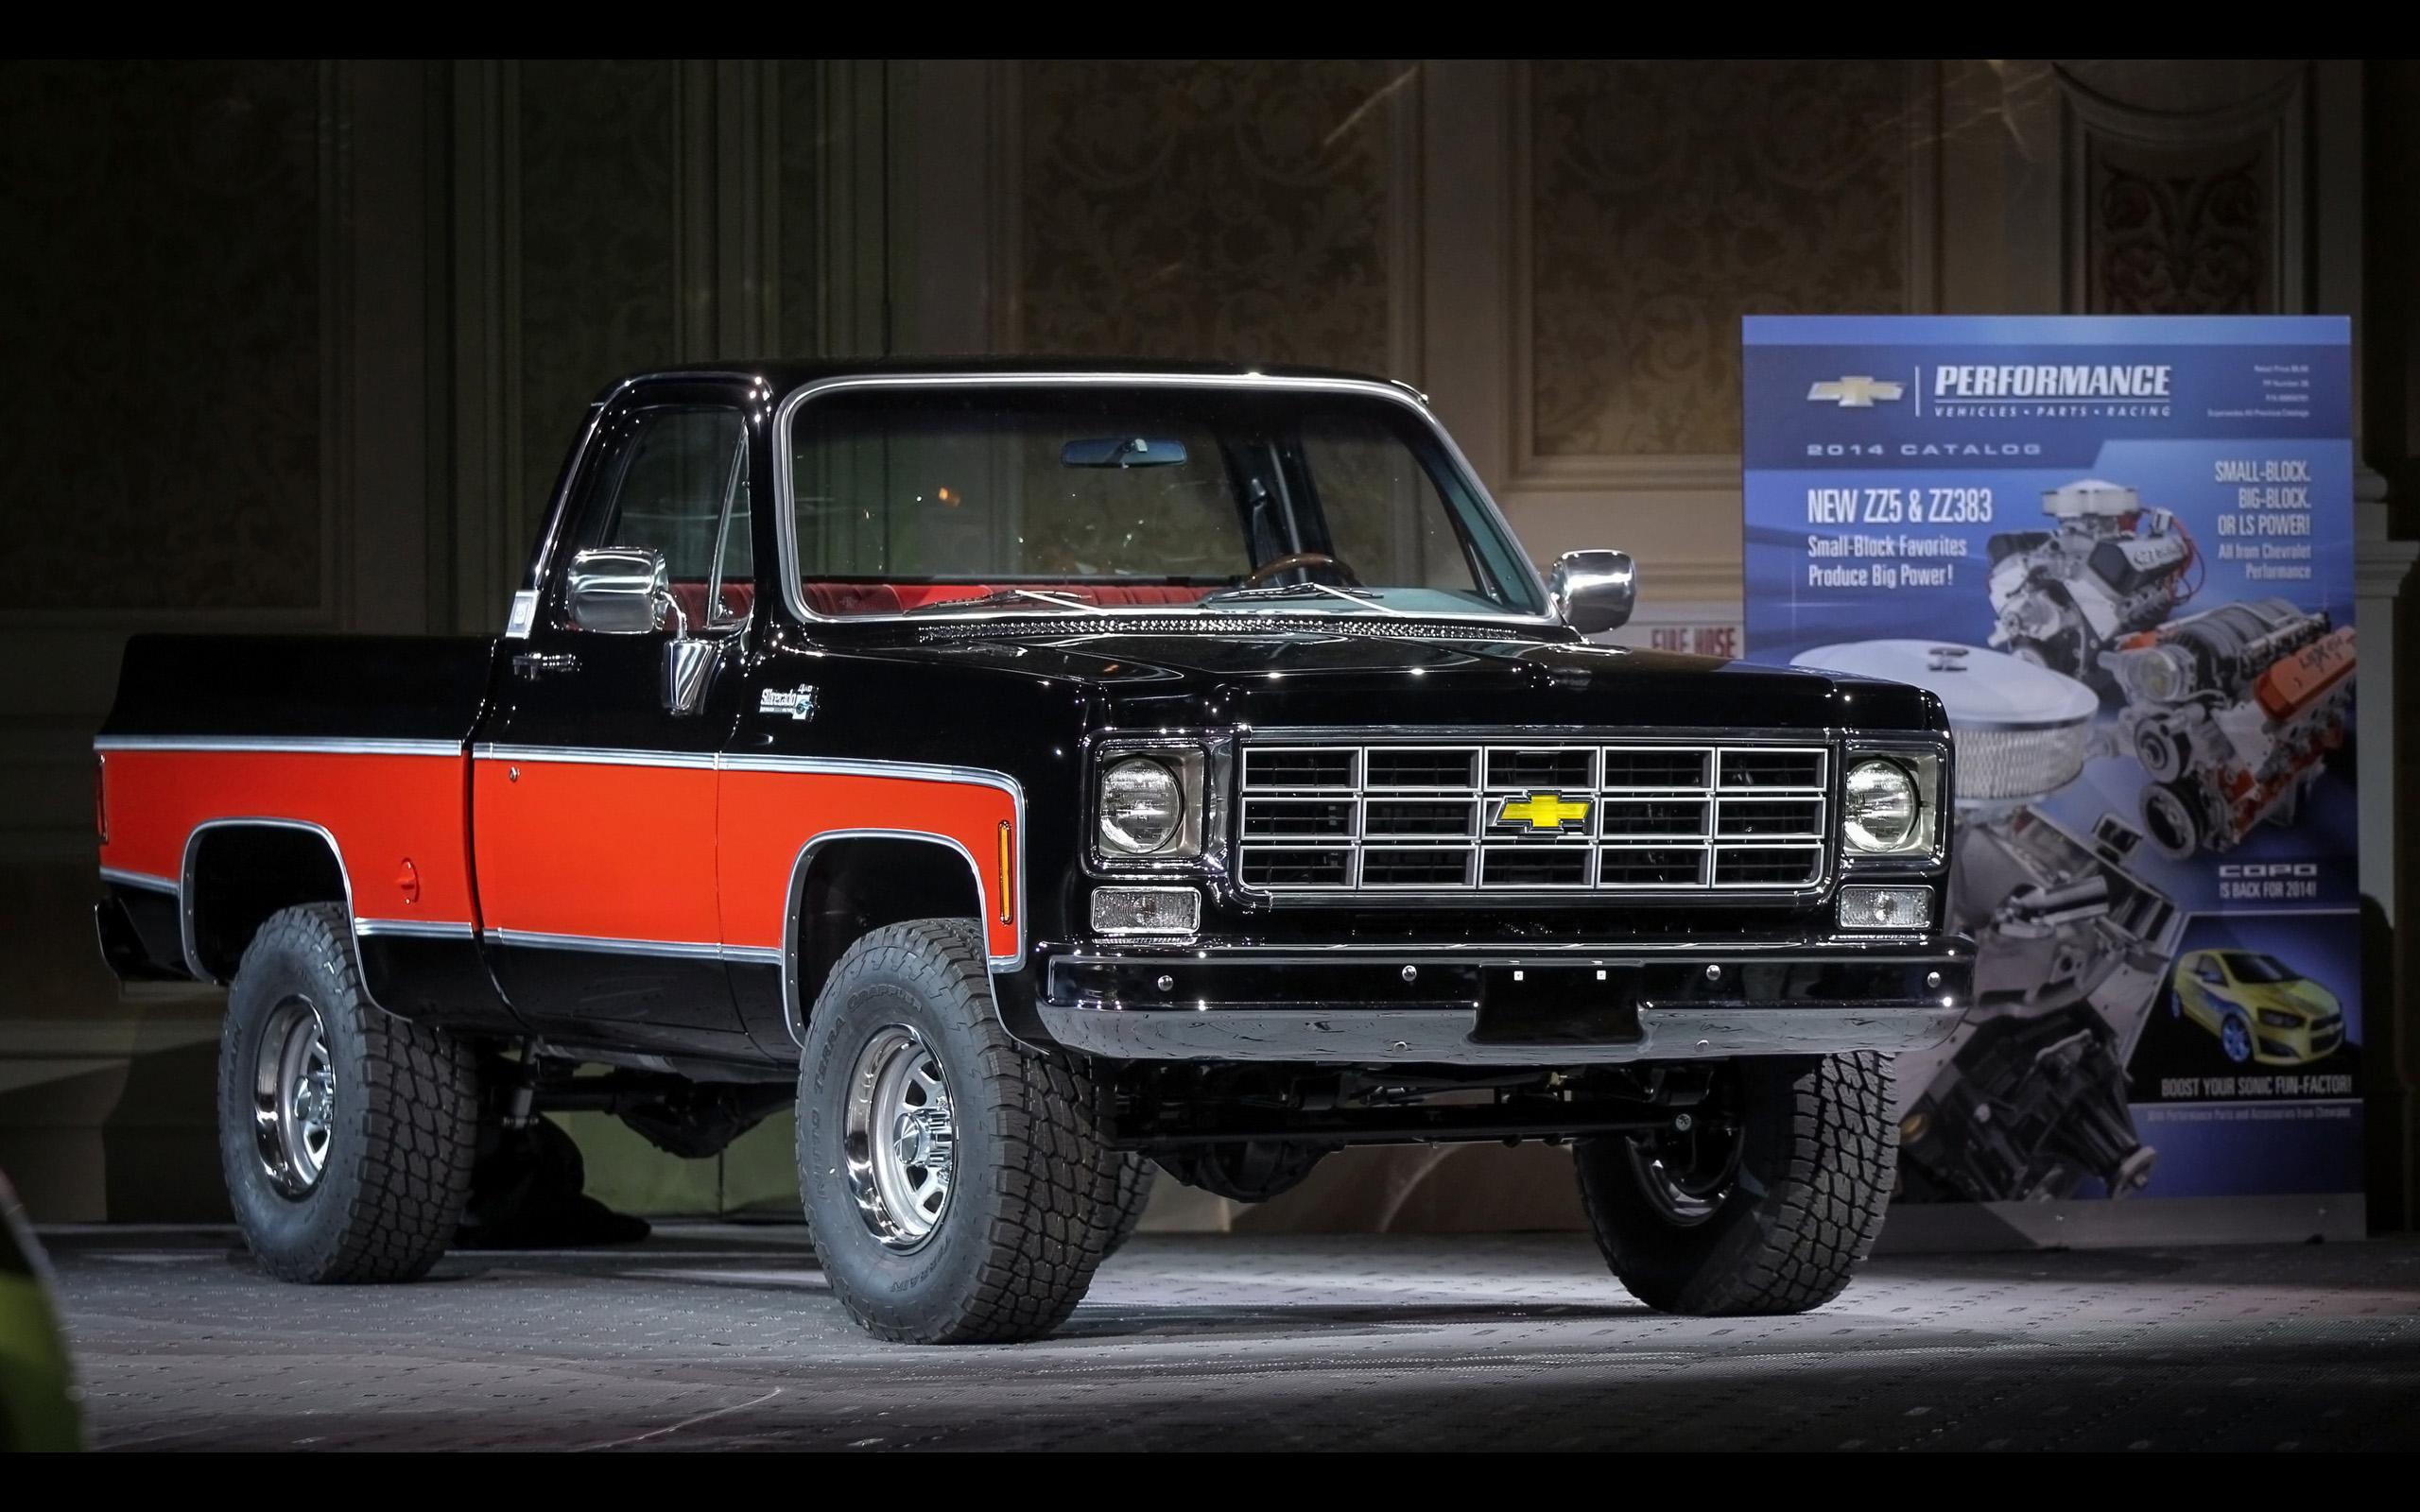 2013 Chevrolet Truck Concepts at SEMA   1978 4x4 Pickup   3 2560x1600